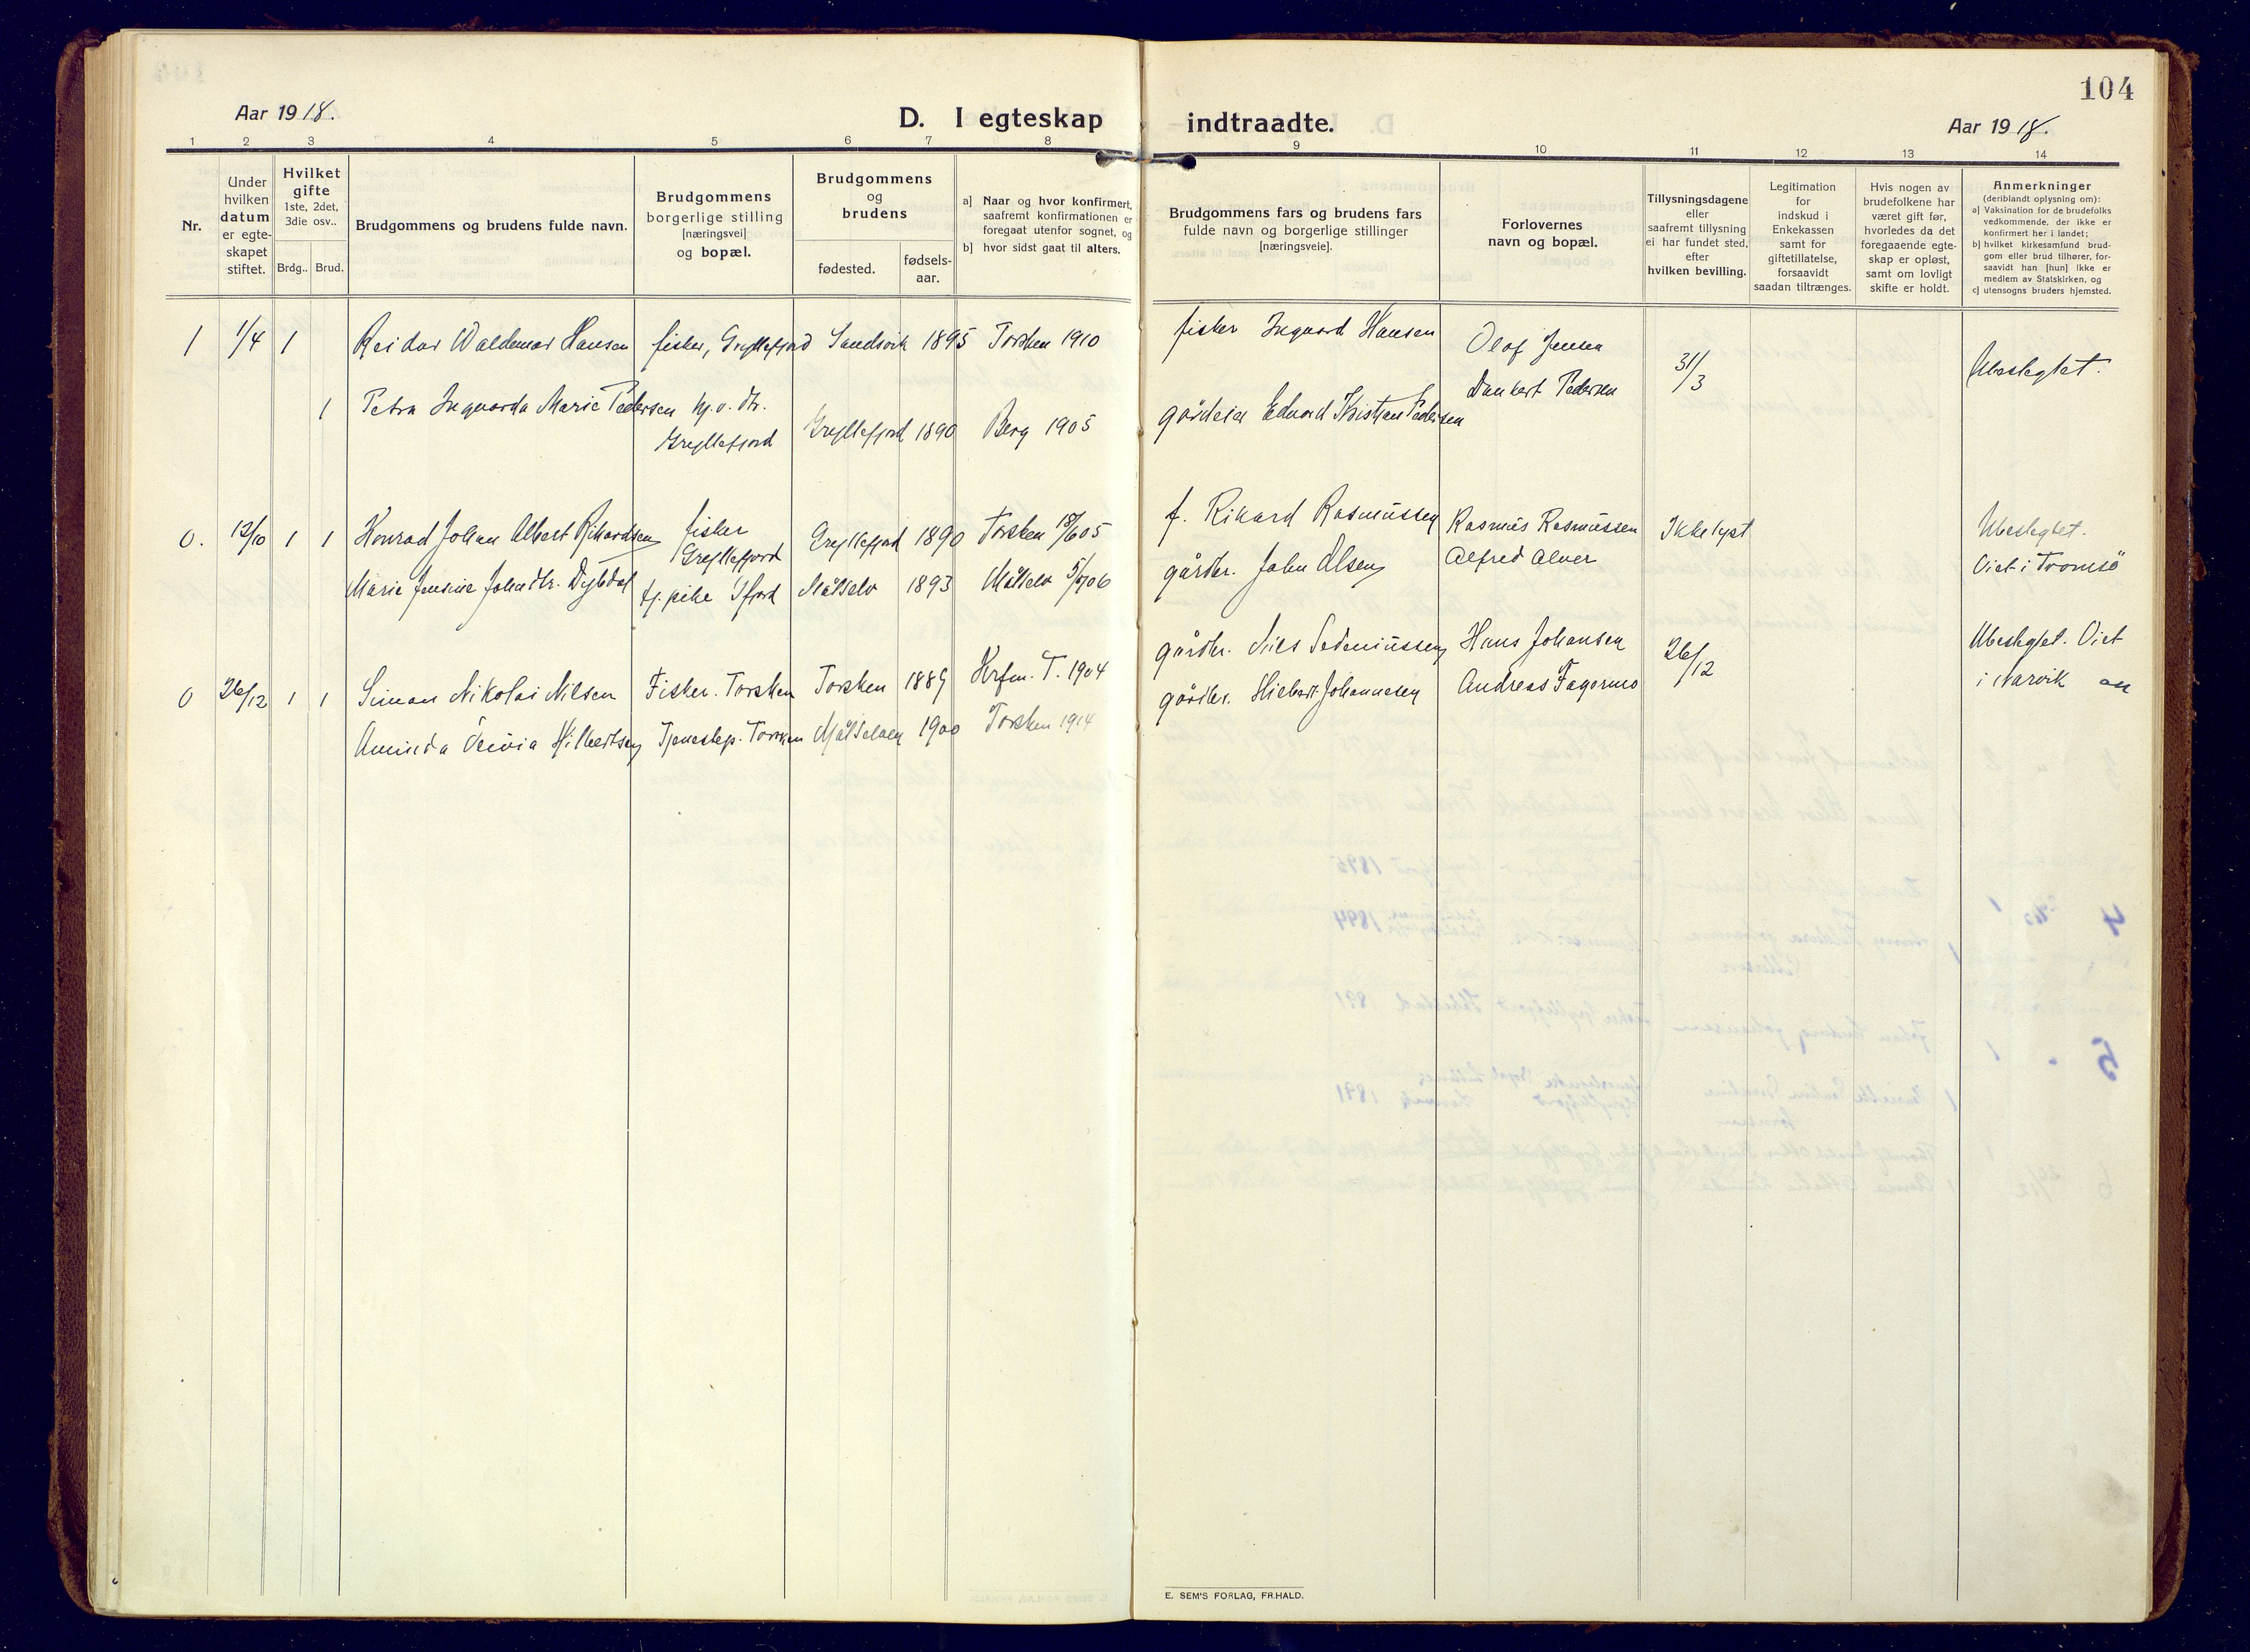 SATØ, Mefjord/Berg sokneprestkontor, G/Ga/Gaa: Ministerialbok nr. 10, 1916-1928, s. 104